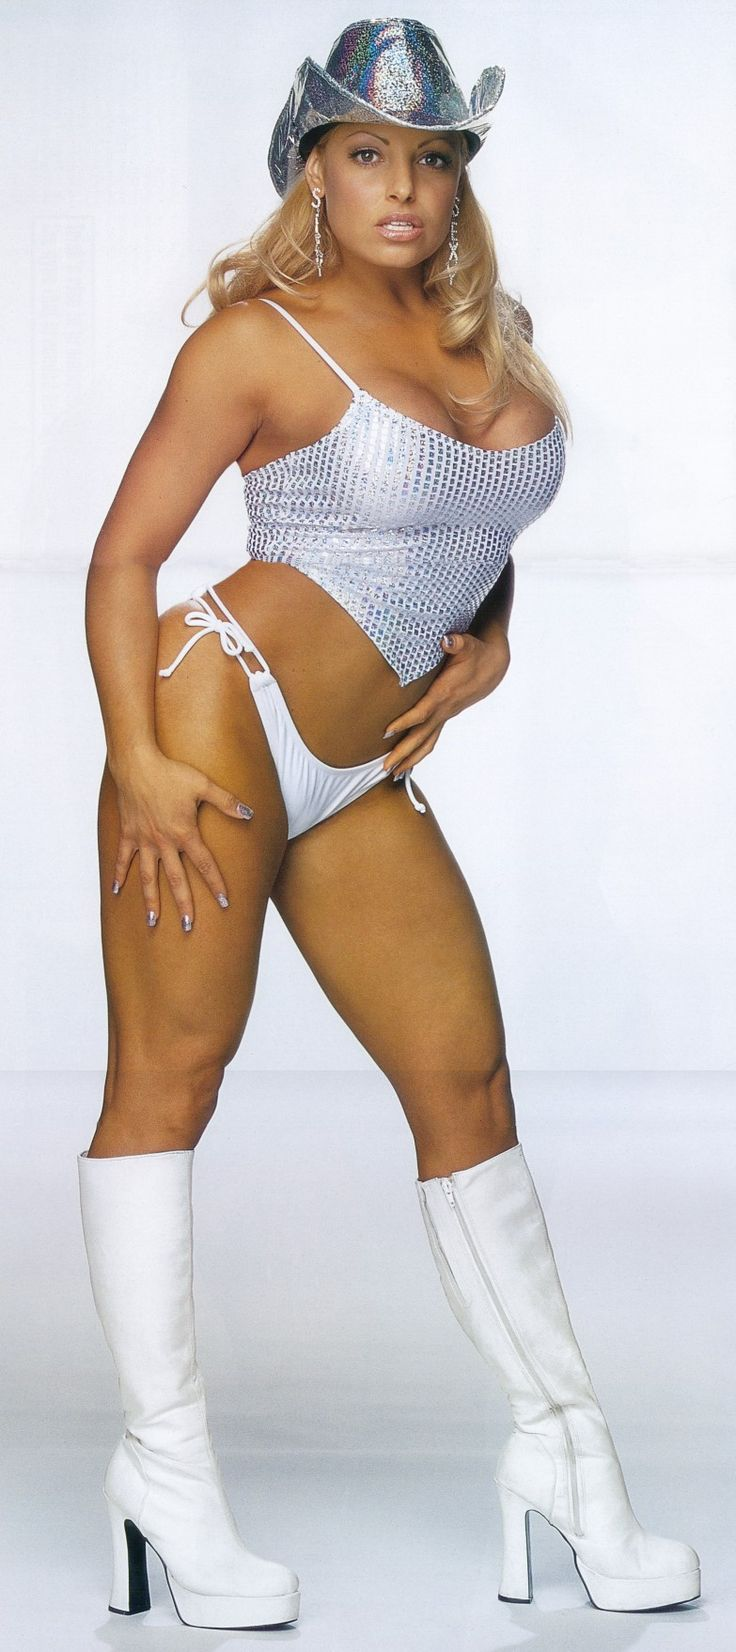 241 best wrestling images on pinterest | wrestling, wwe wrestlers